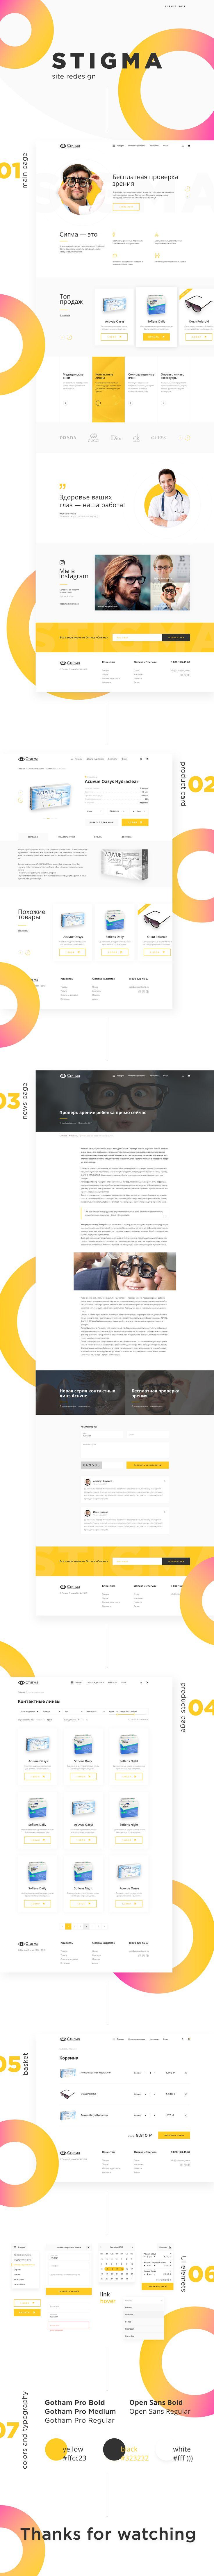 Stigma - network of optics salons